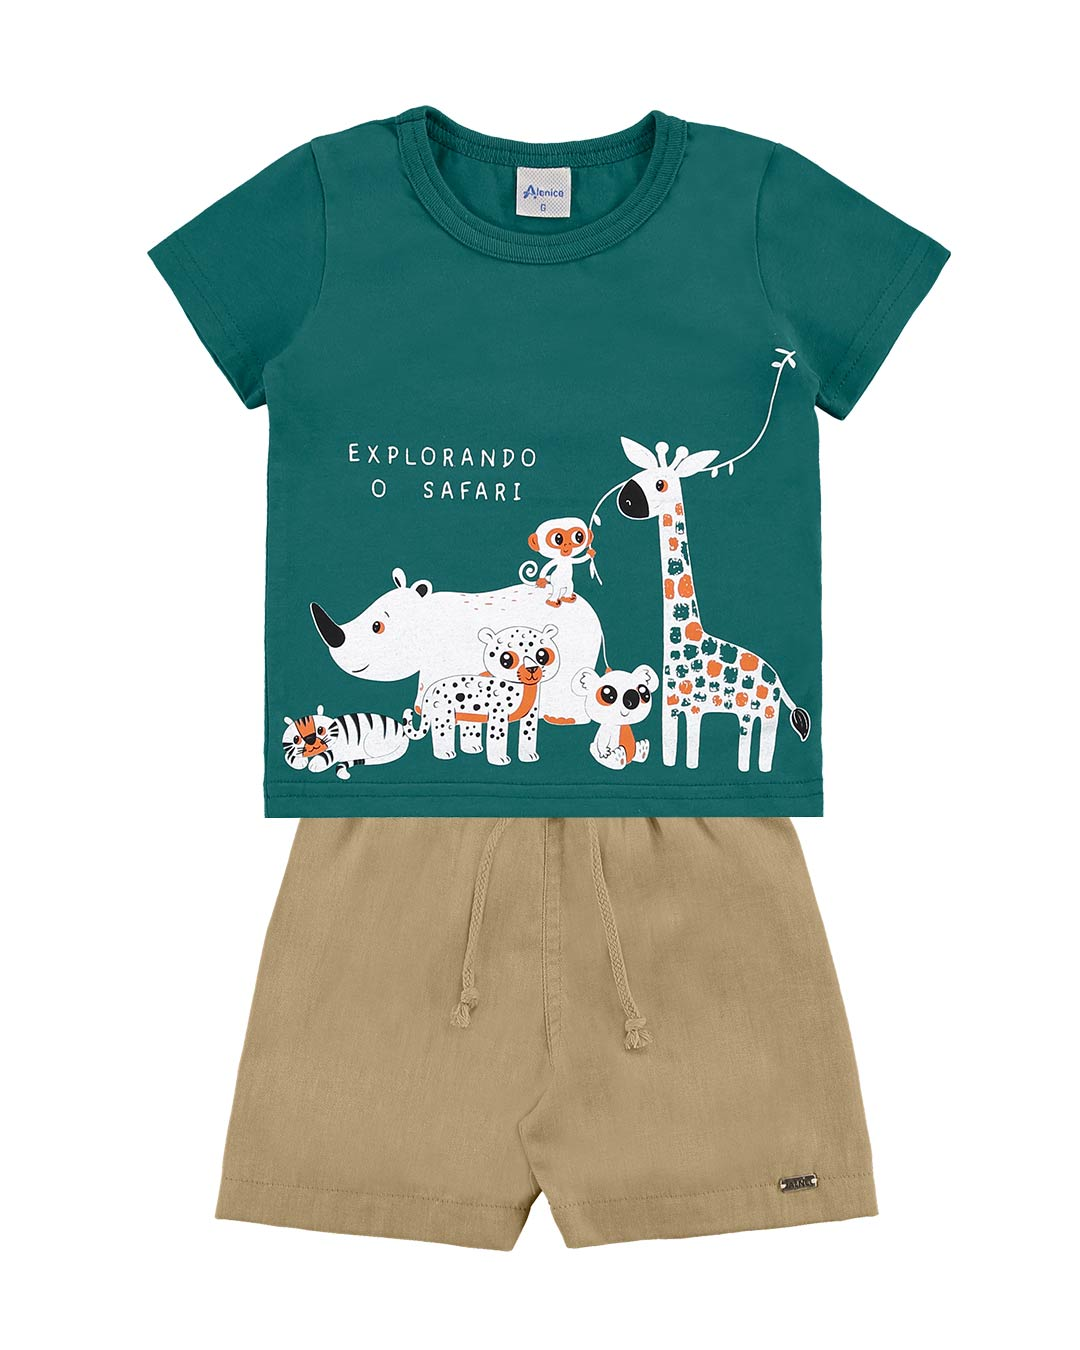 Conjunto Bebê Explorando o Safari - Alenice